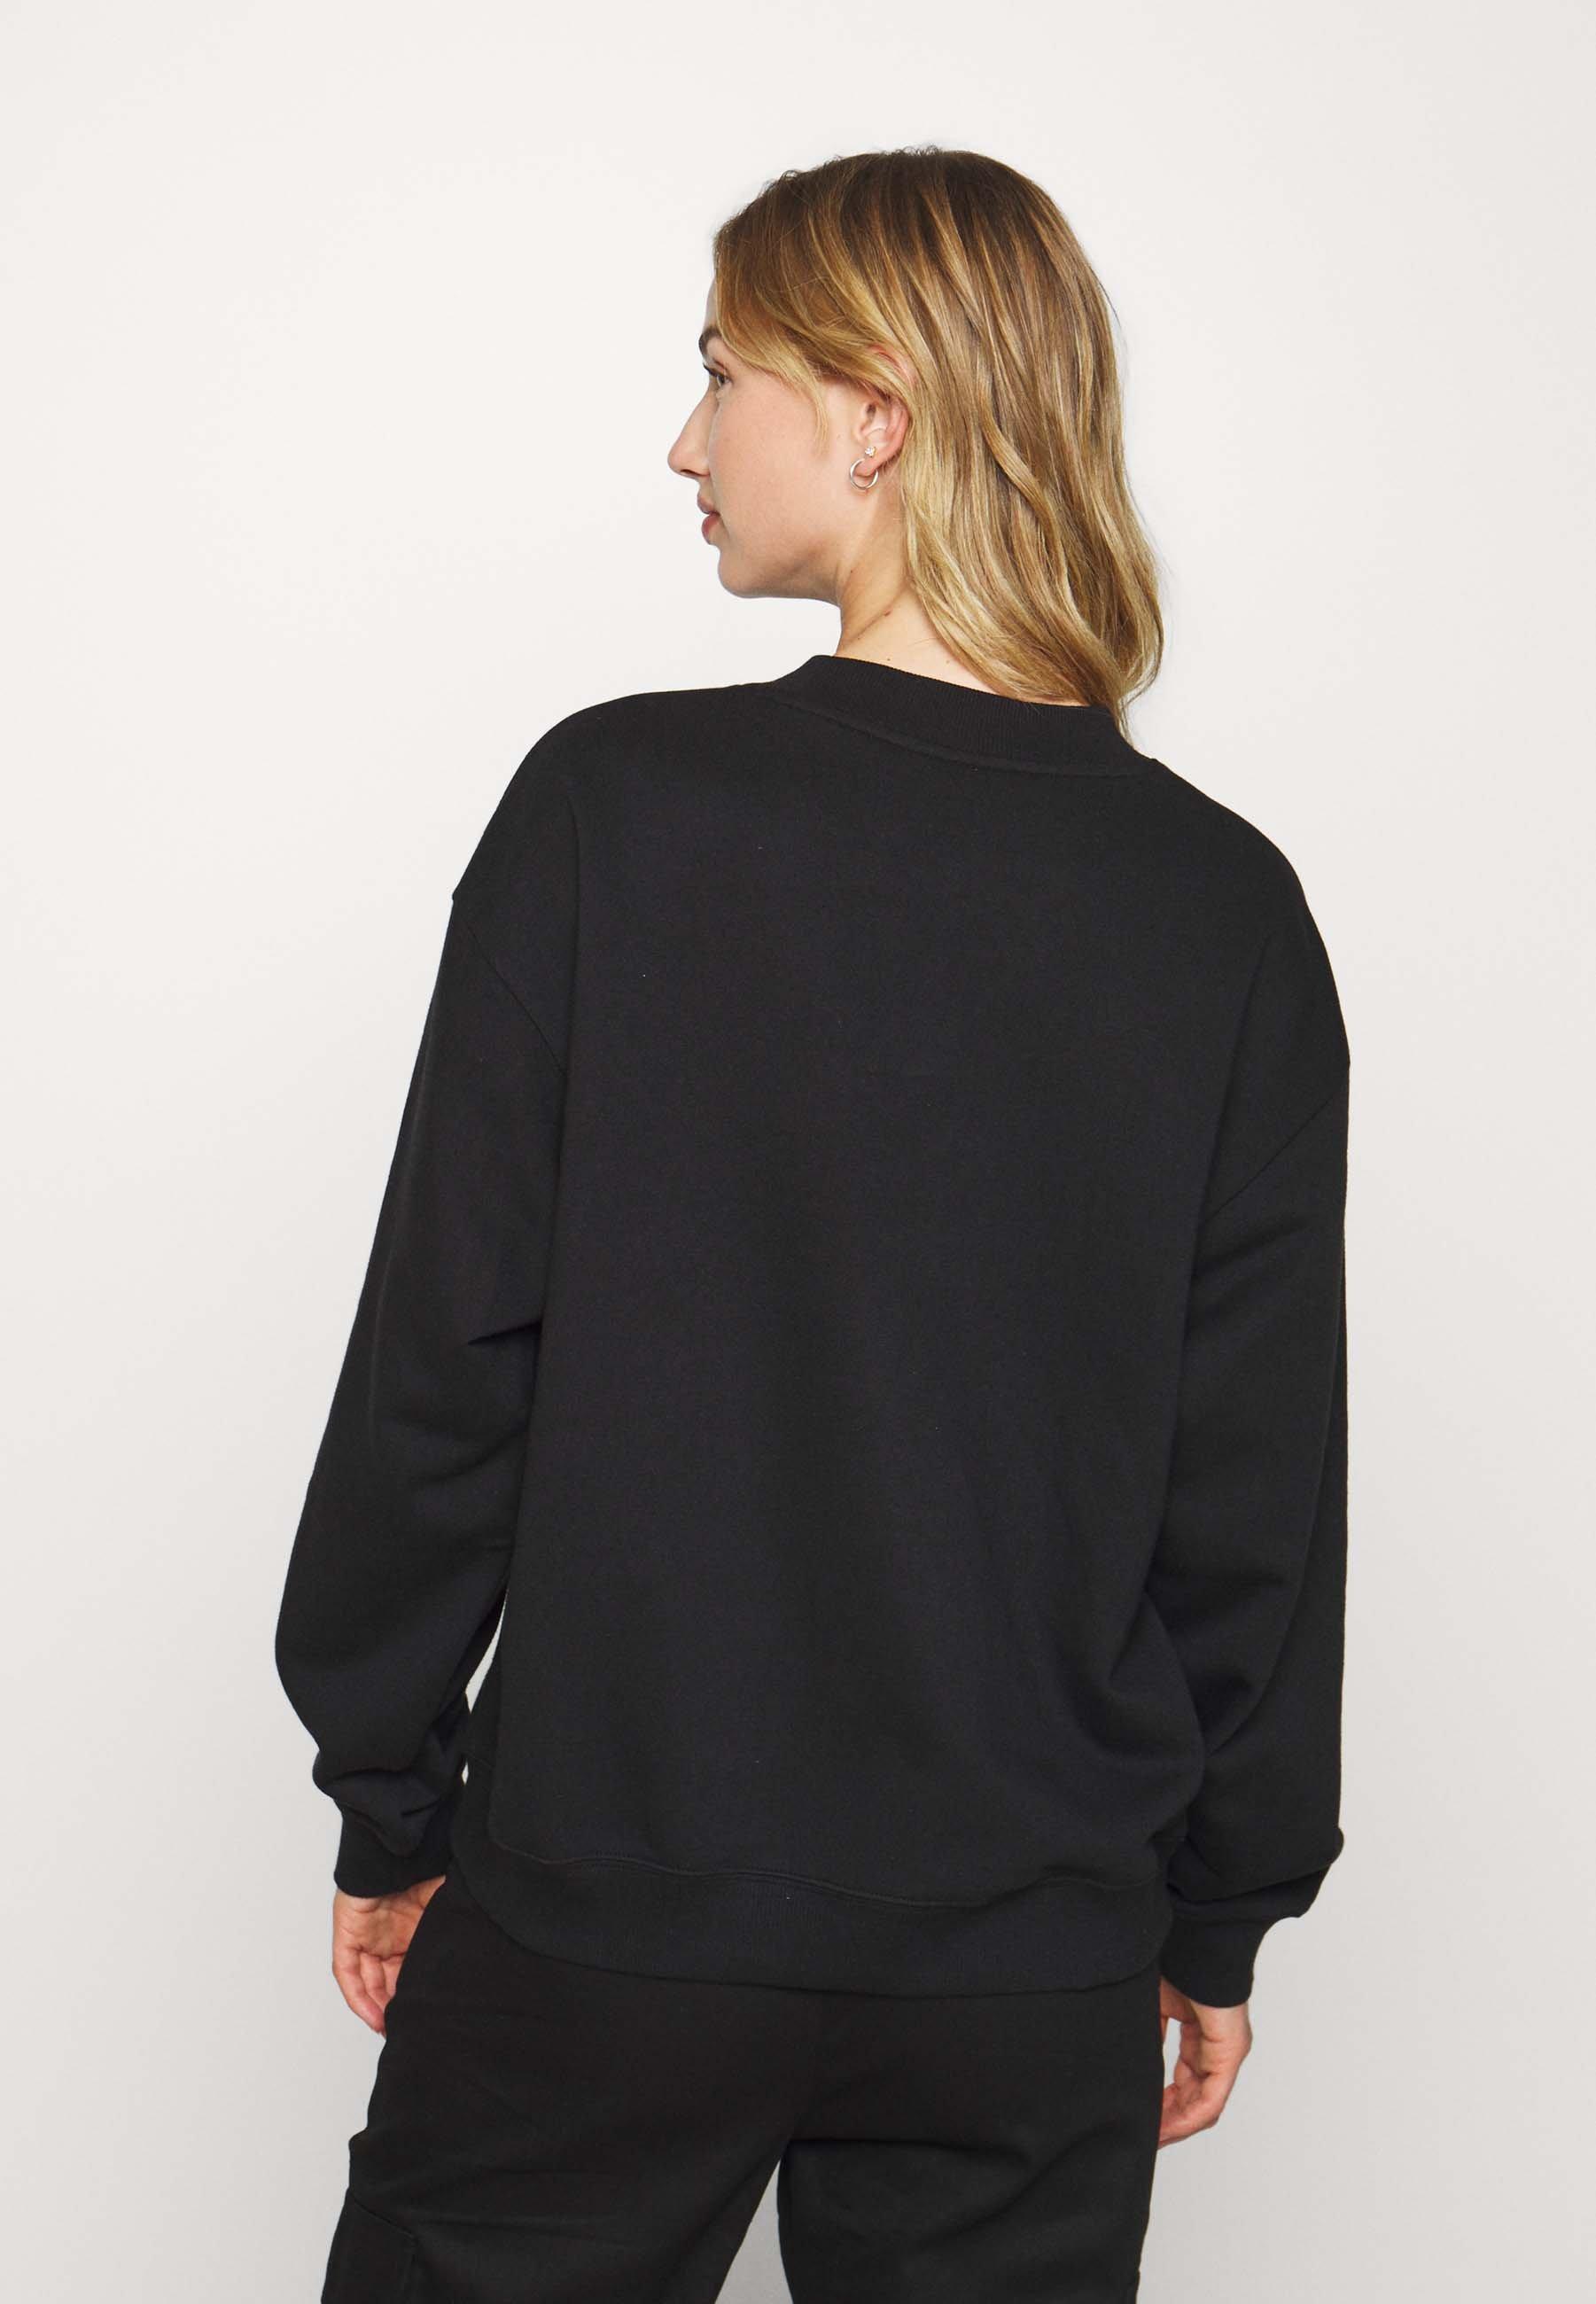 Monki Sweatshirt black dark ZALANDO.FR